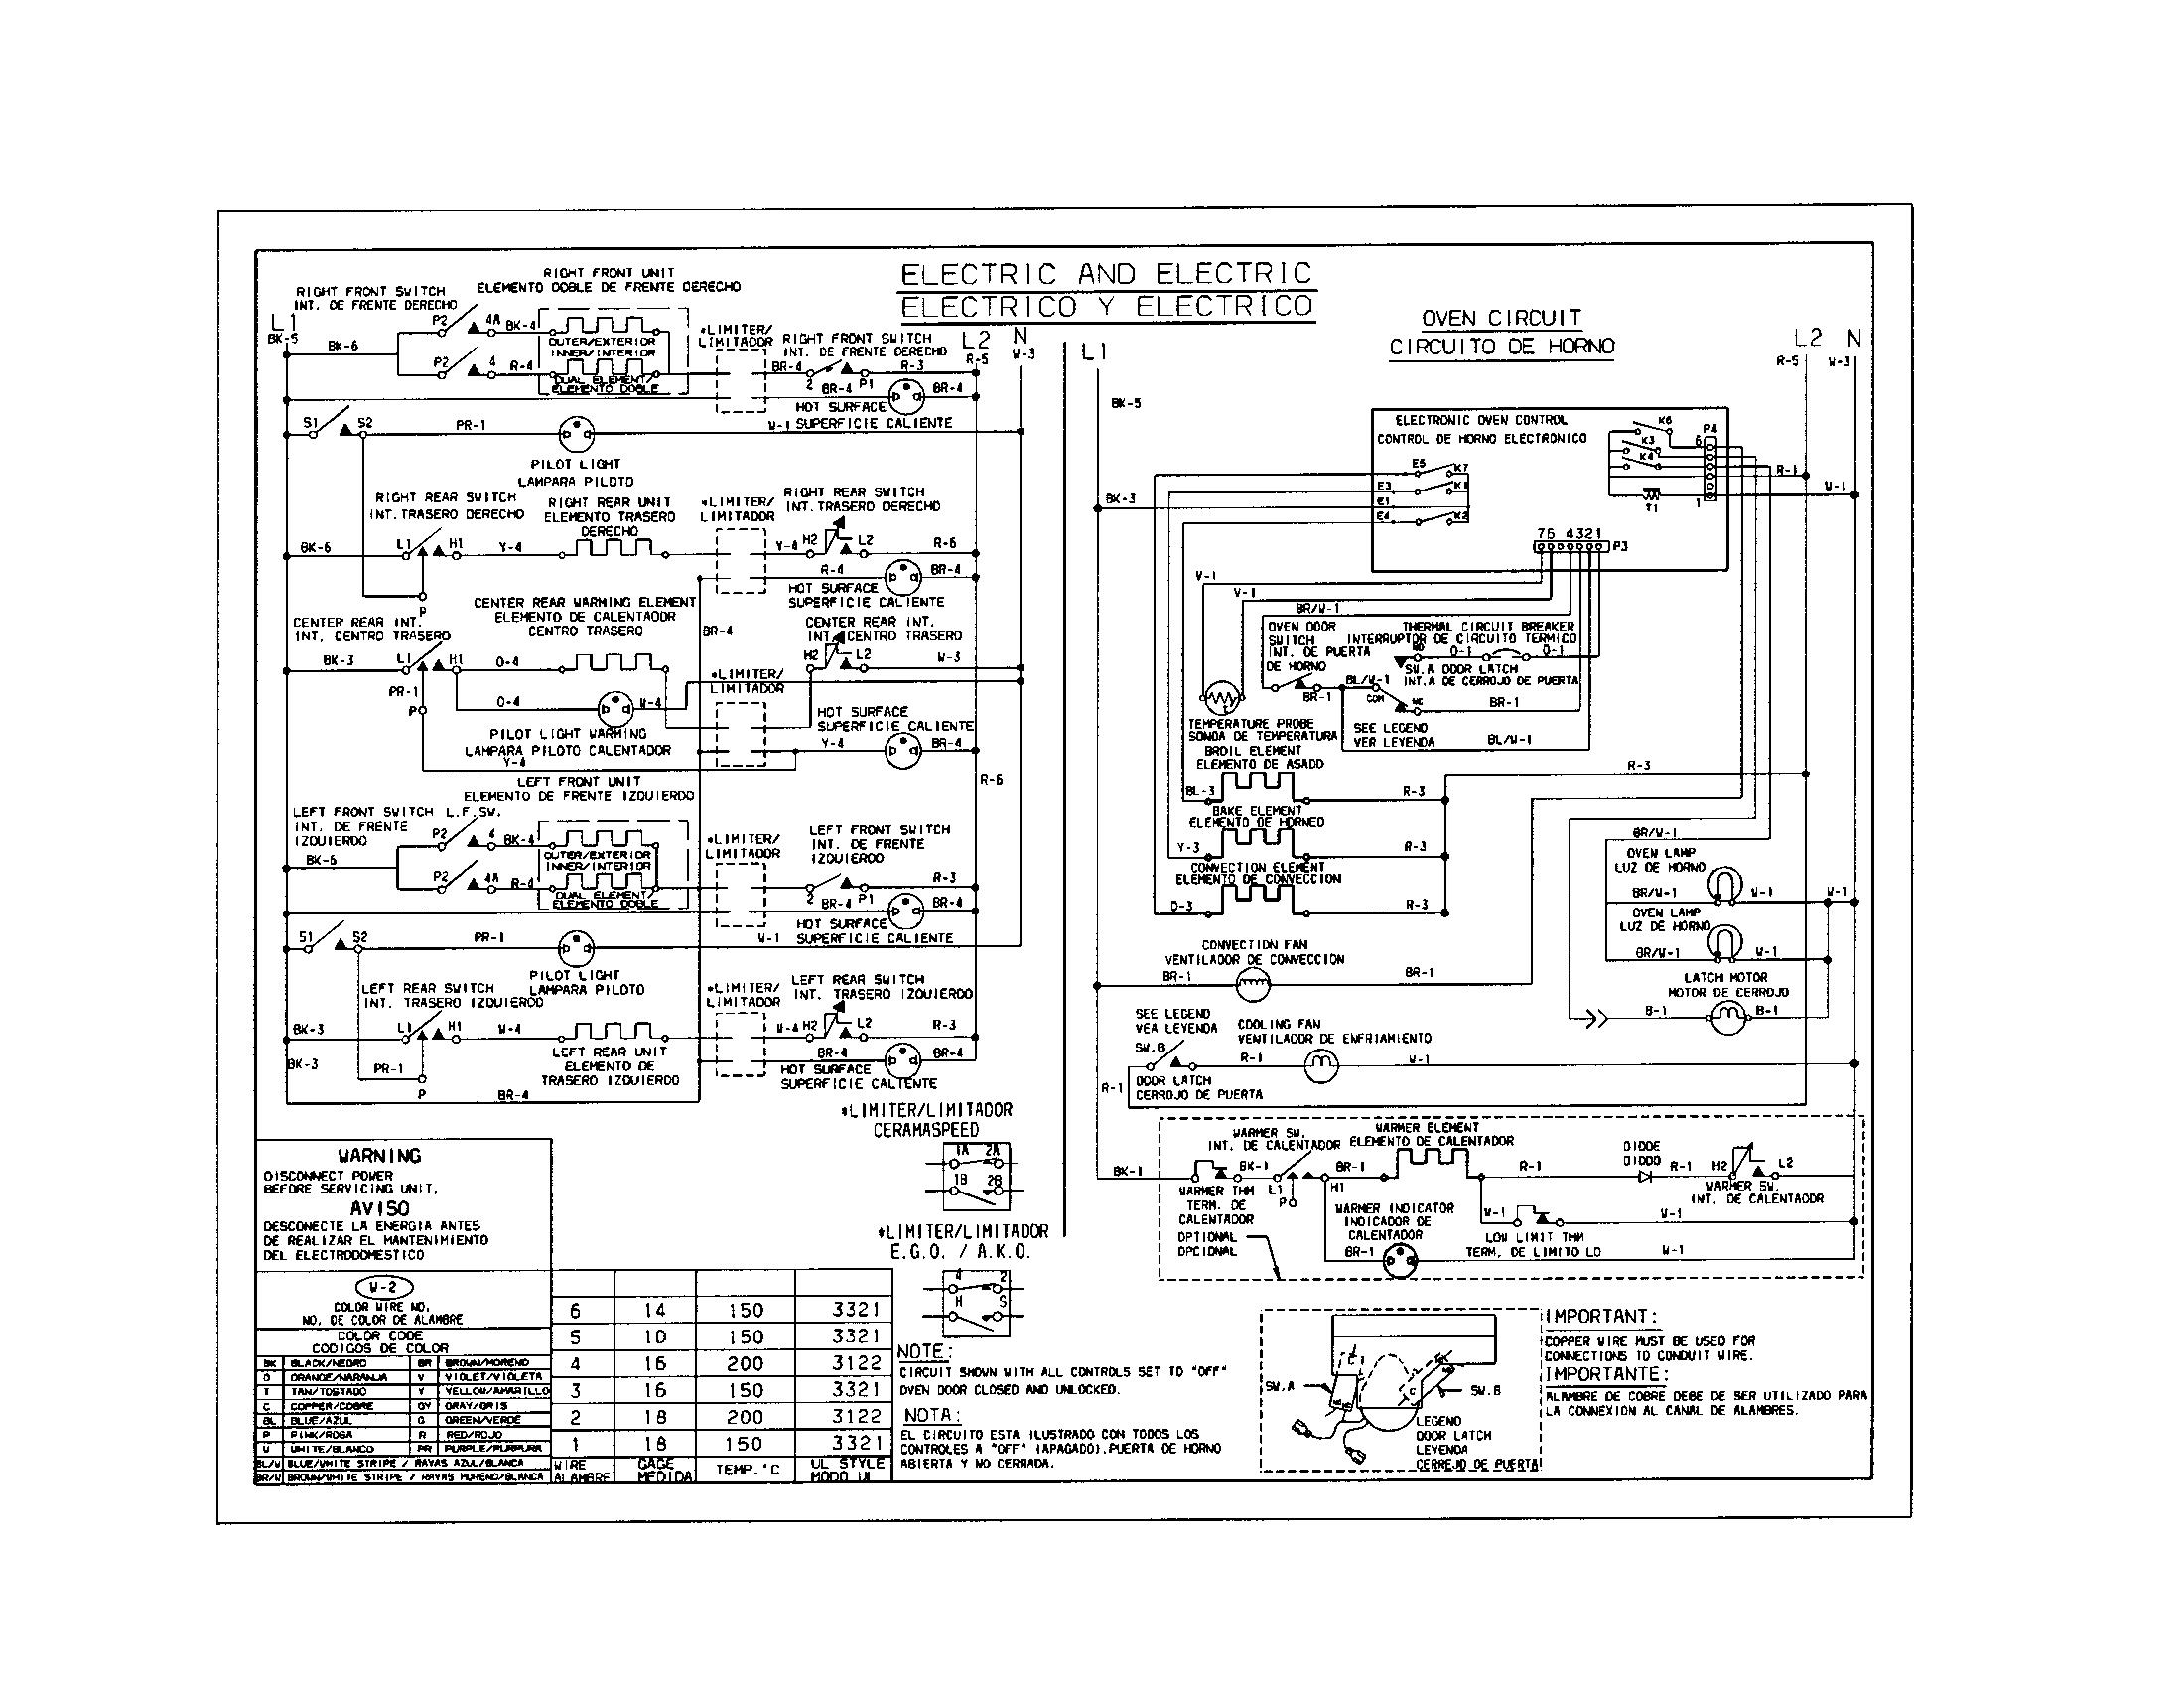 Tremendous Rca Electric Dryer Wiring Diagram Basic Electronics Wiring Diagram Wiring Cloud Rdonaheevemohammedshrineorg